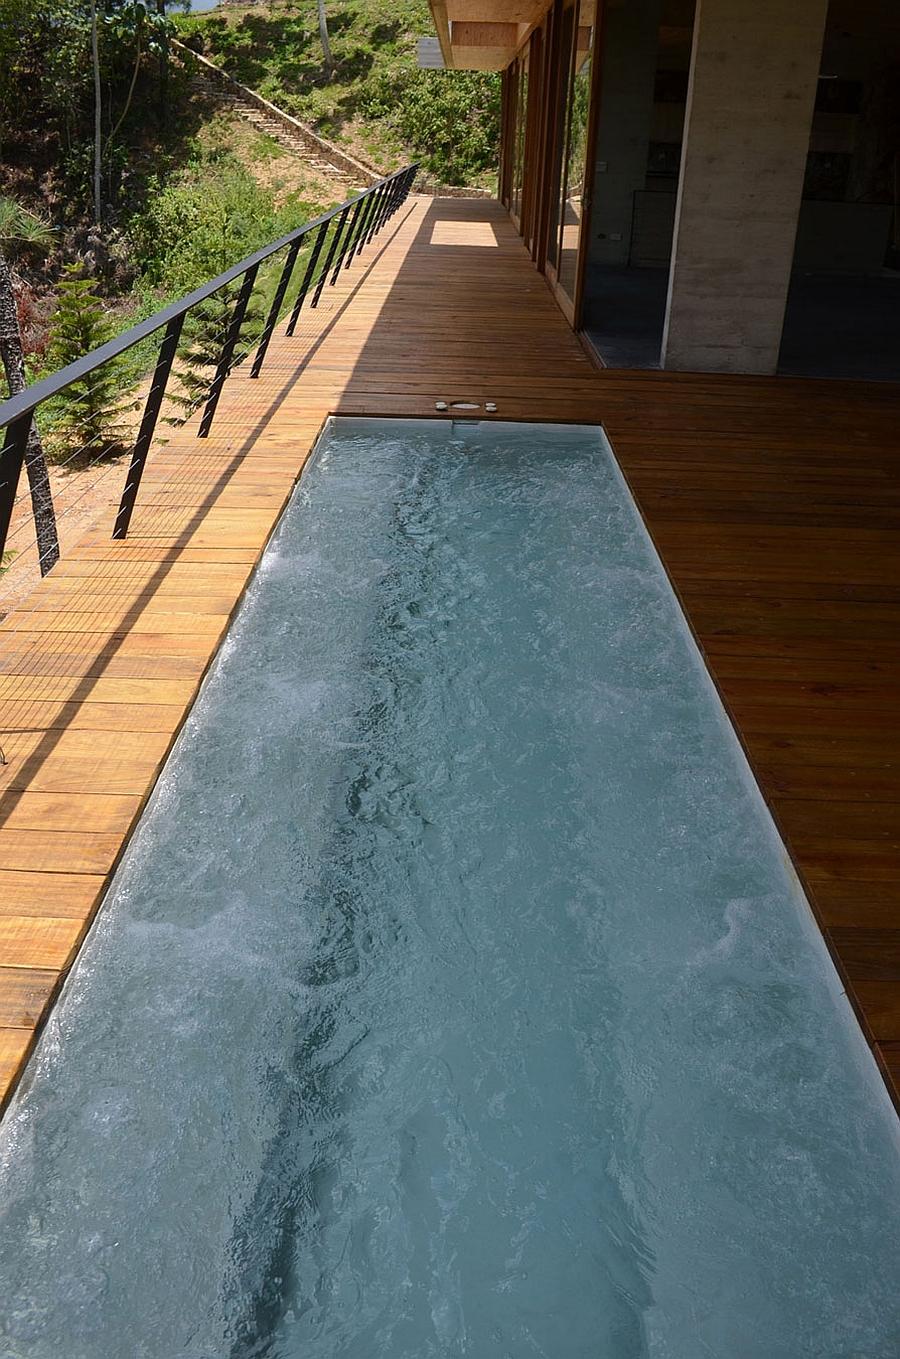 Private terrace of the serene Dominican Republic home